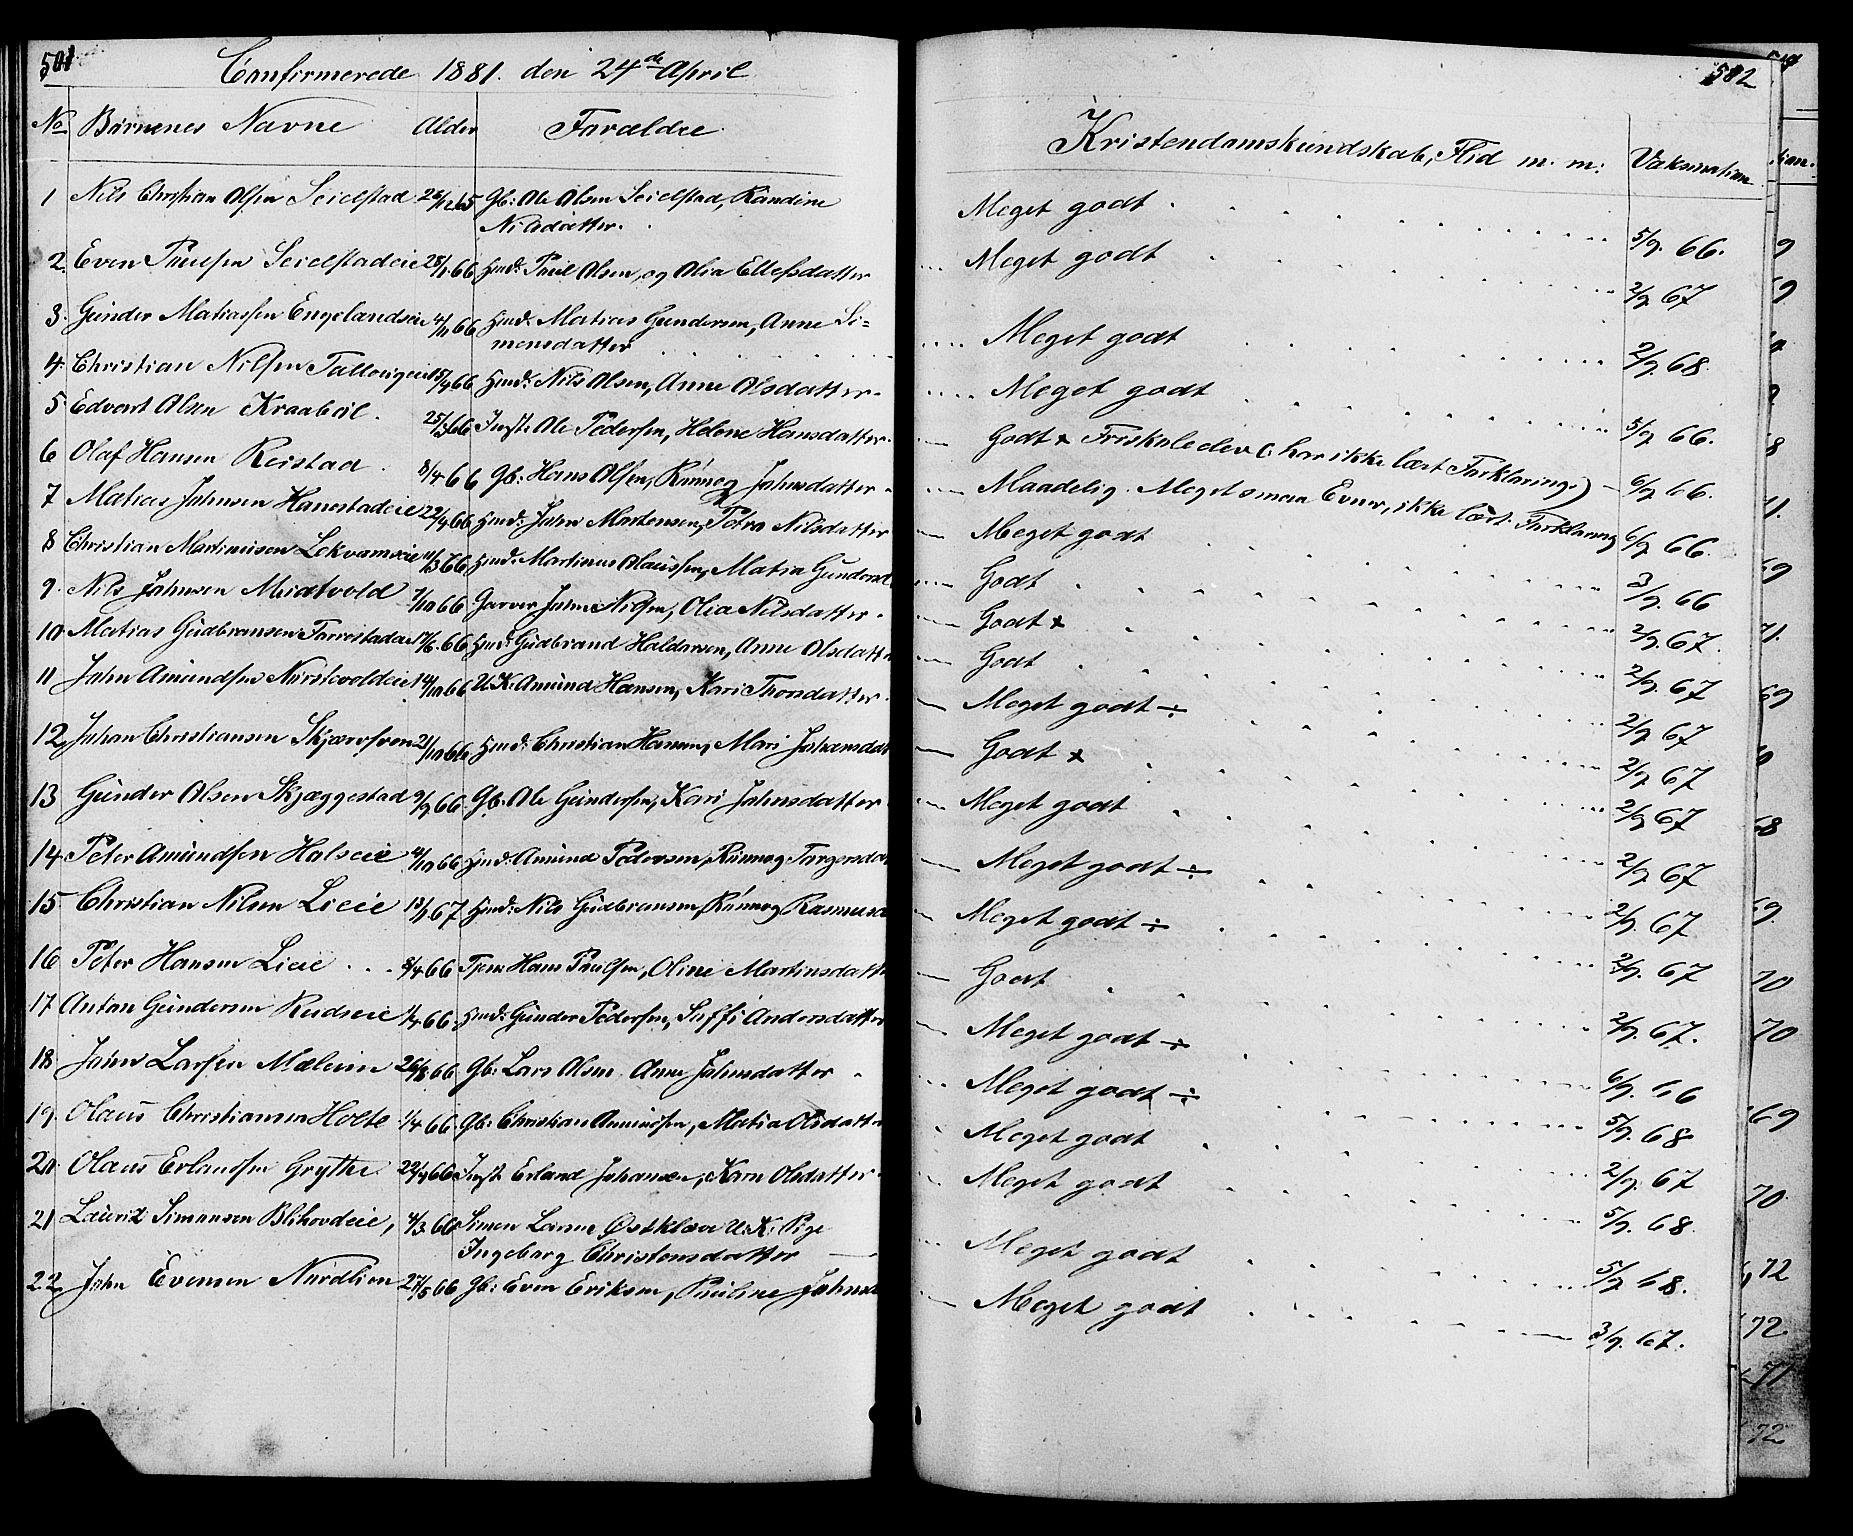 SAH, Østre Gausdal prestekontor, Klokkerbok nr. 1, 1863-1893, s. 501-502